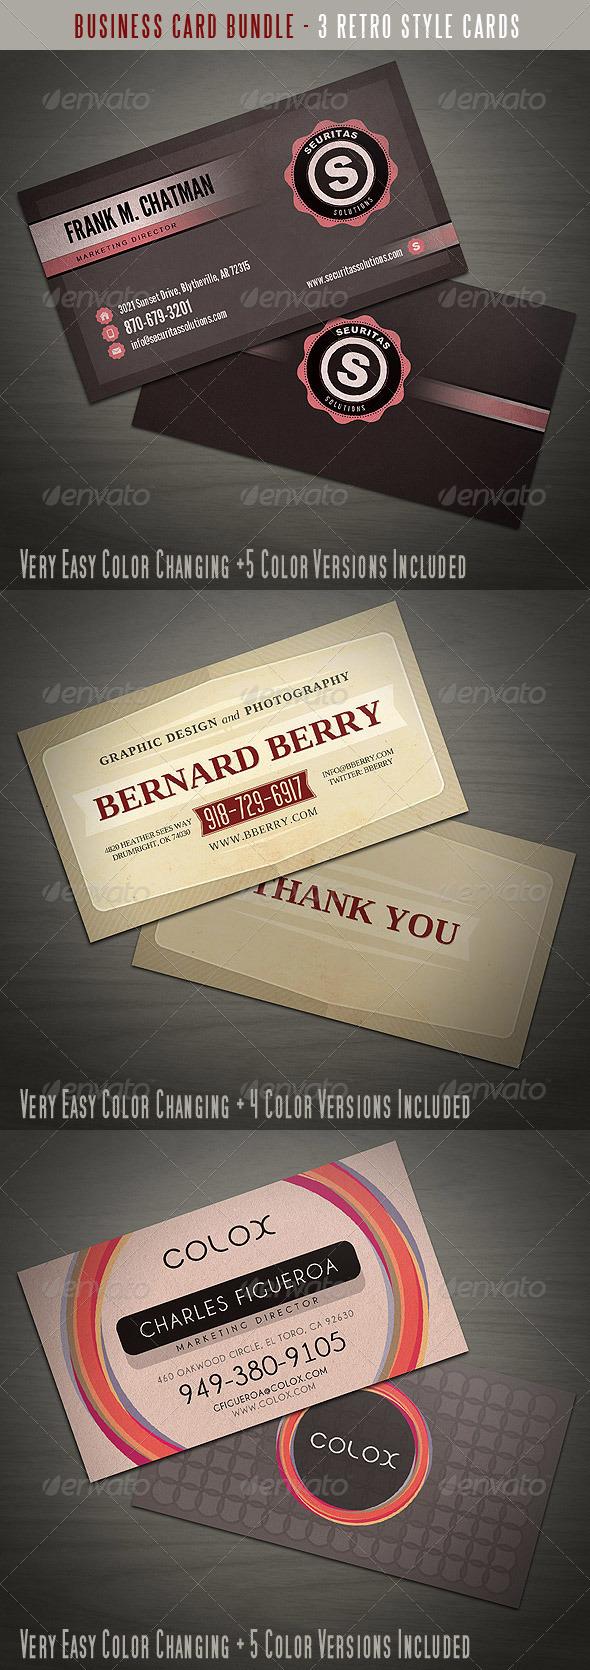 Retro Business Card Bundle - Retro/Vintage Business Cards